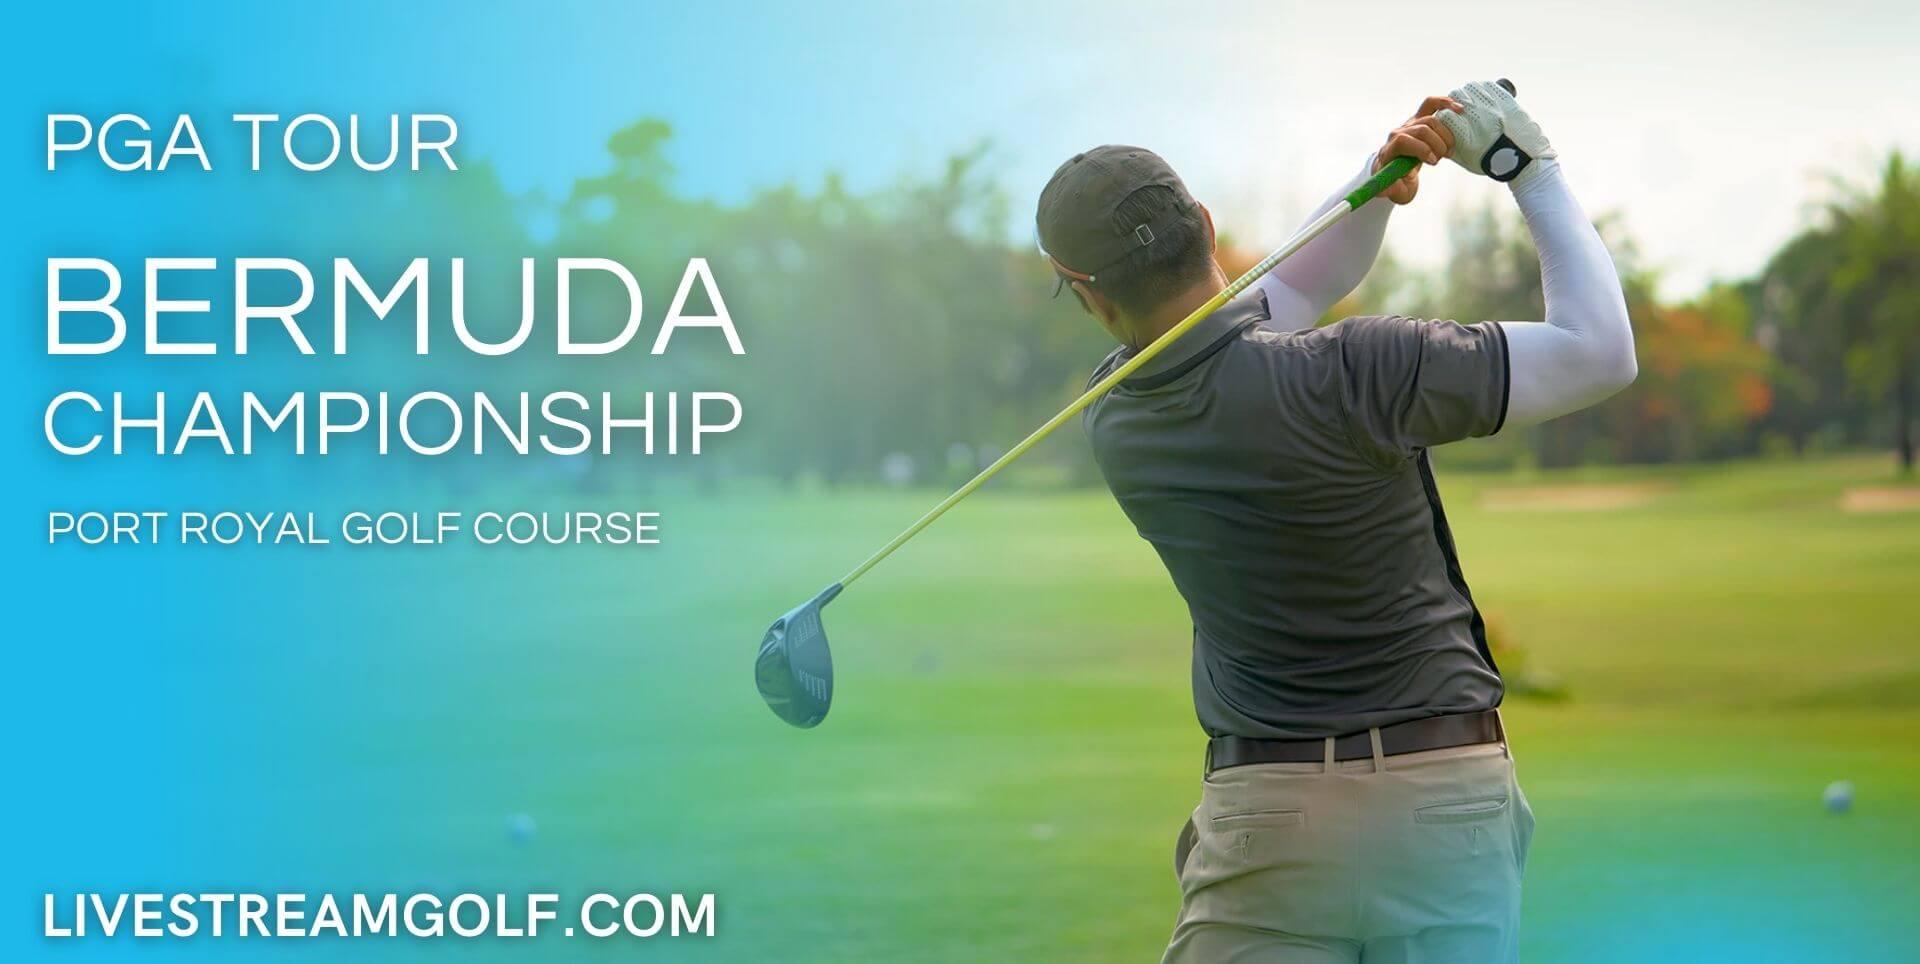 Bermuda Championship PGA Golf Live Stream